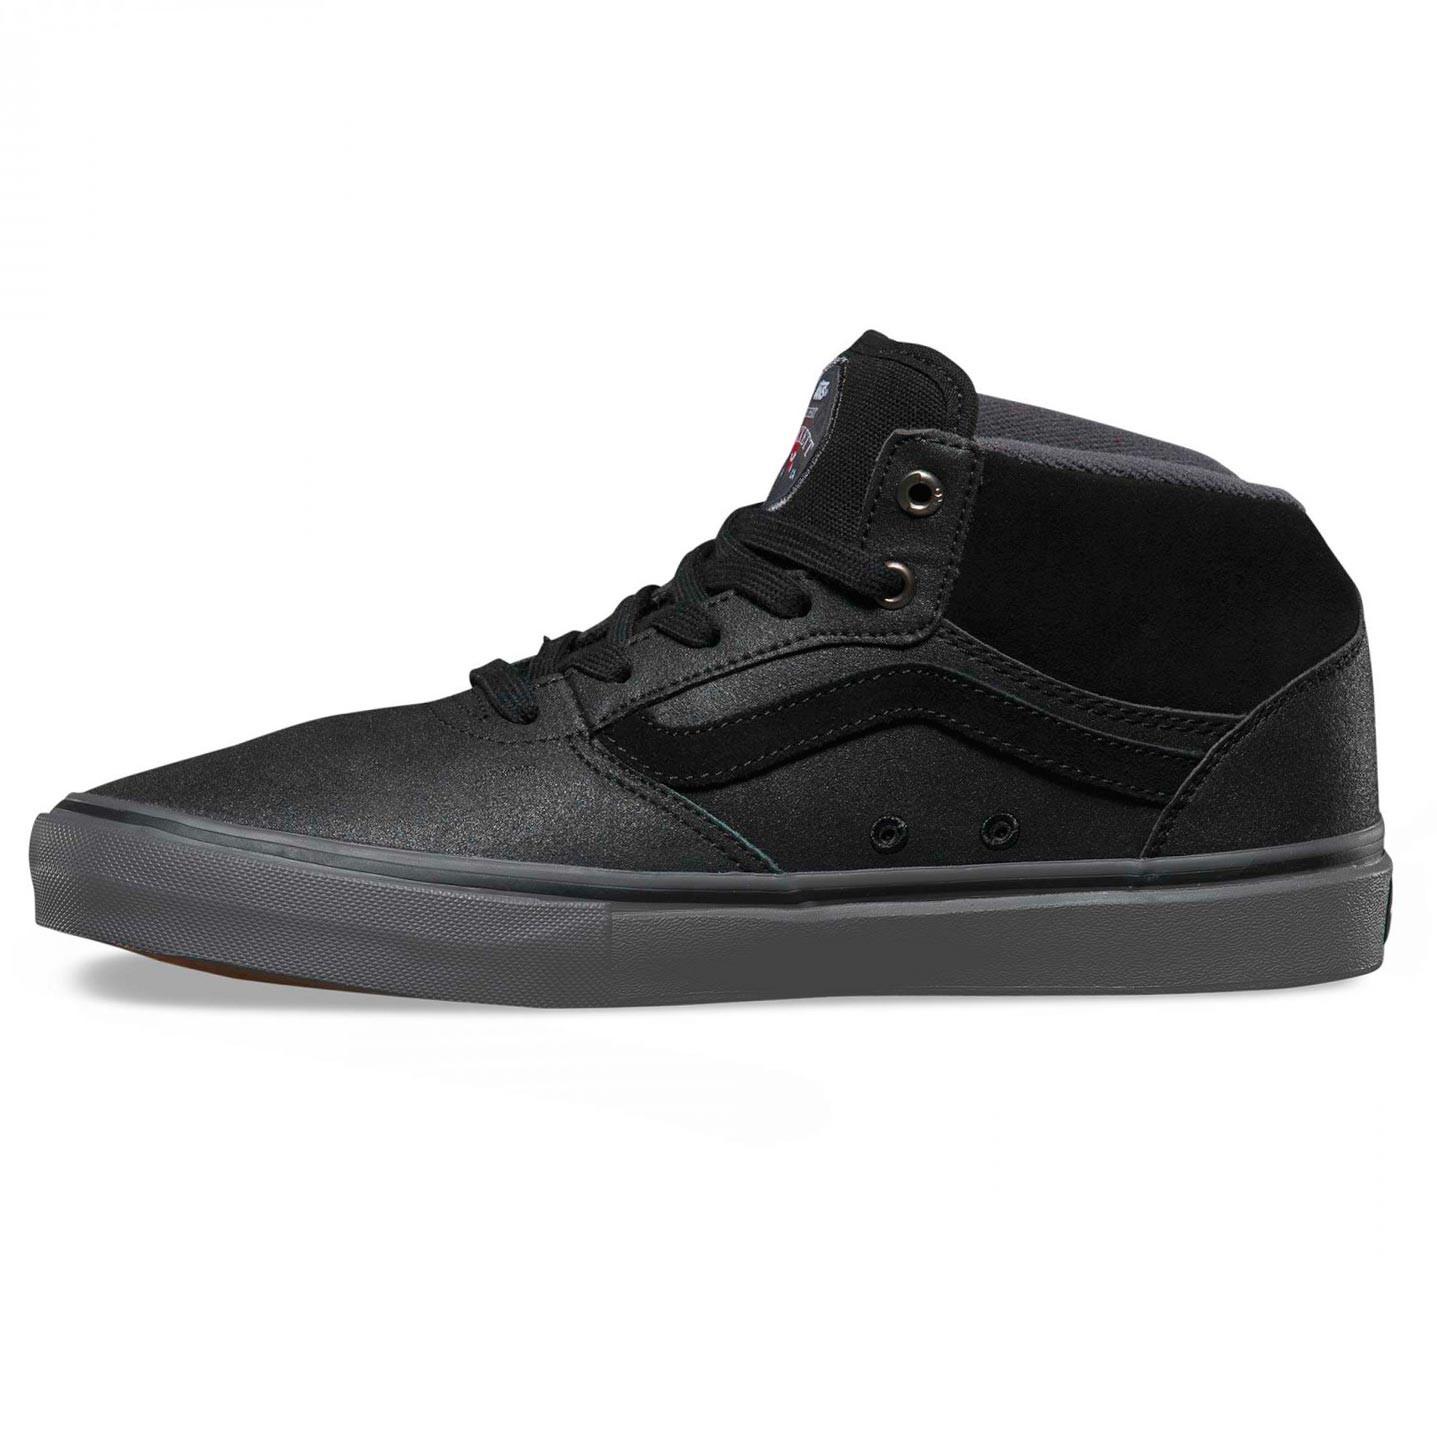 4a231cb46a Vans Gilbert Crockett Pro Mid xtuff black grey